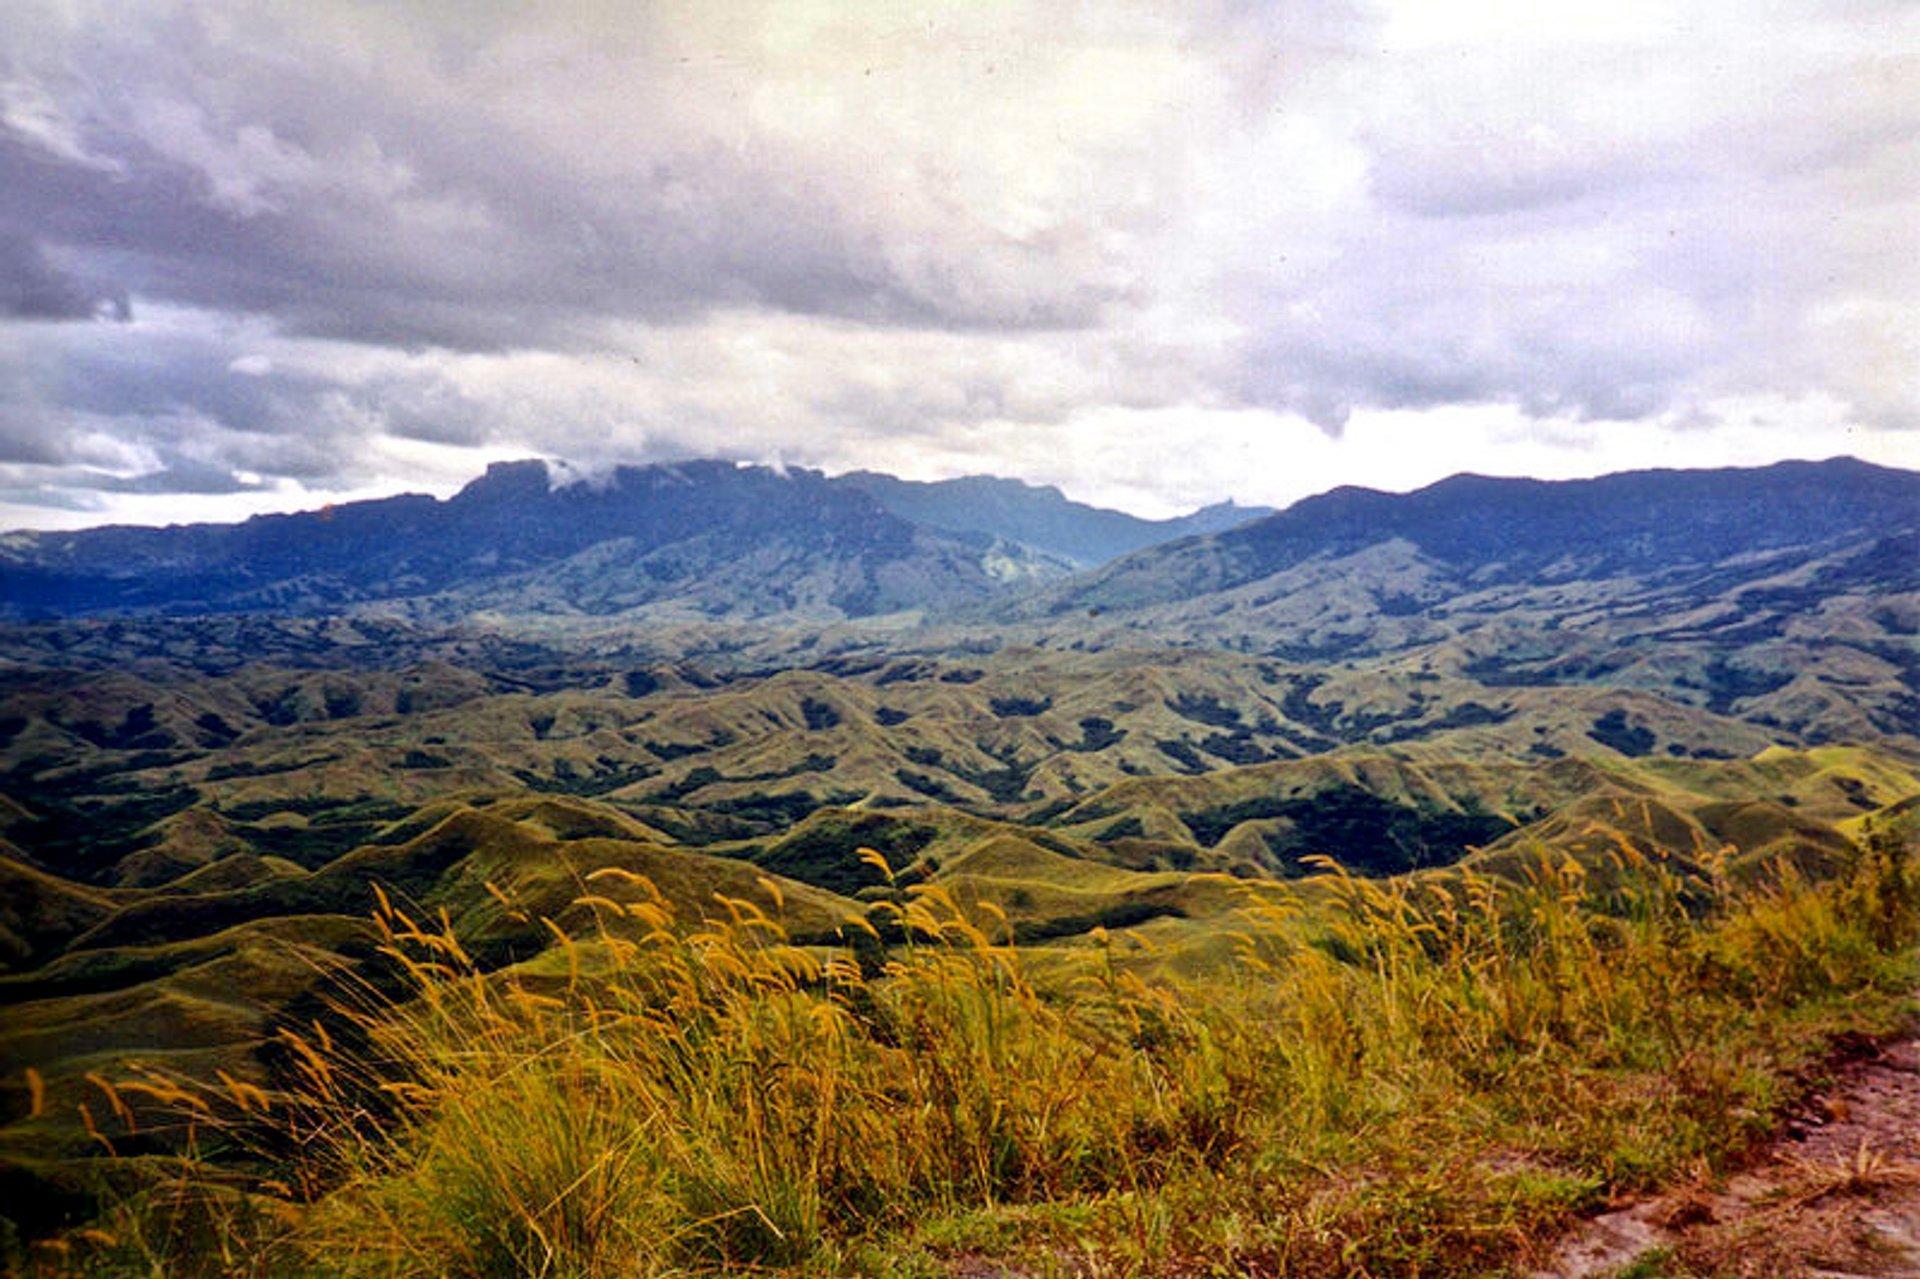 Nausori Highlands in Fiji - Best Season 2019